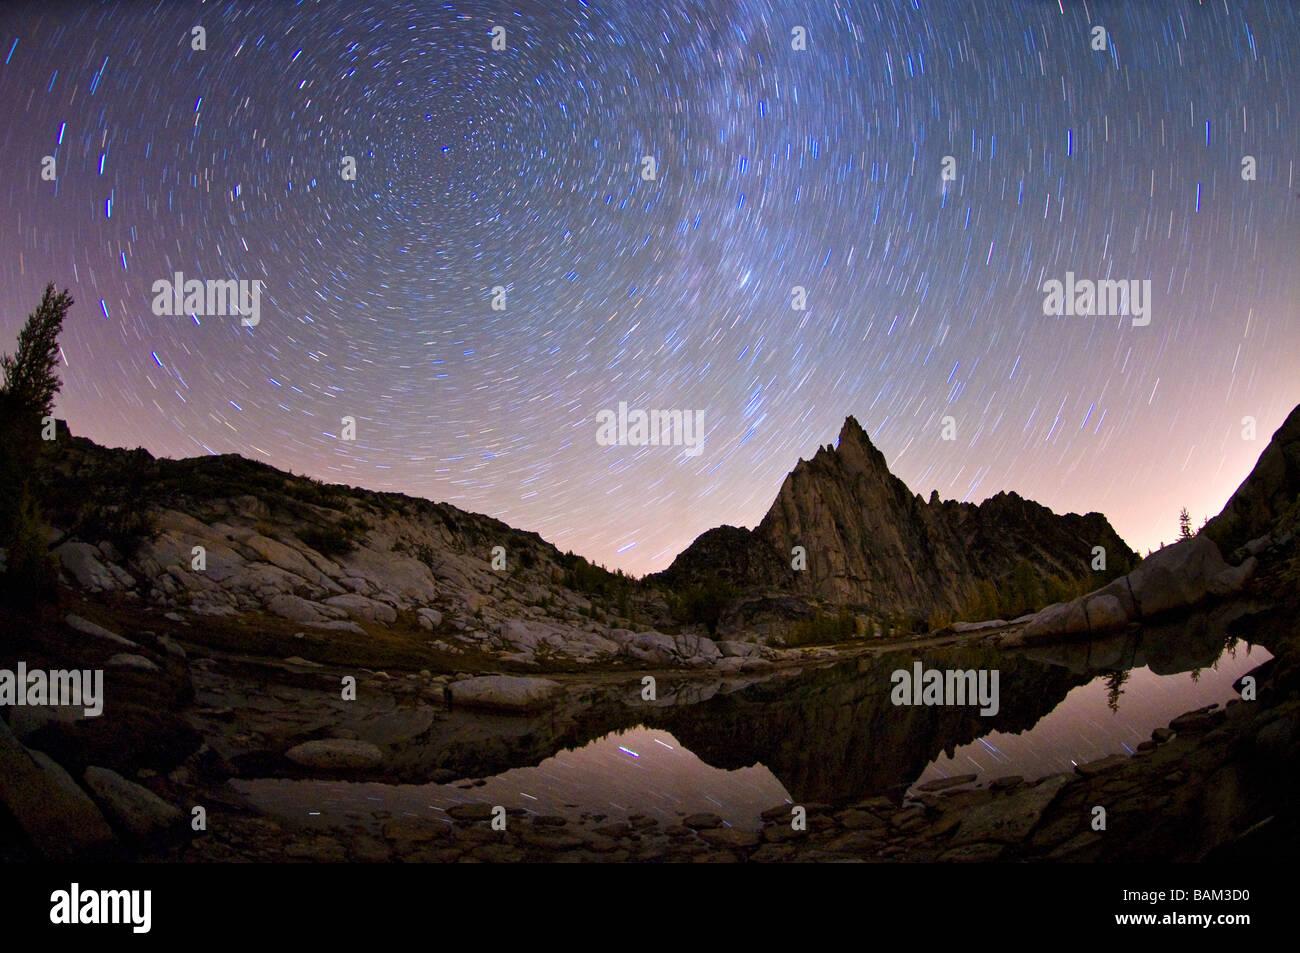 Prusik peak gnome tarn and stars in sky - Stock Image